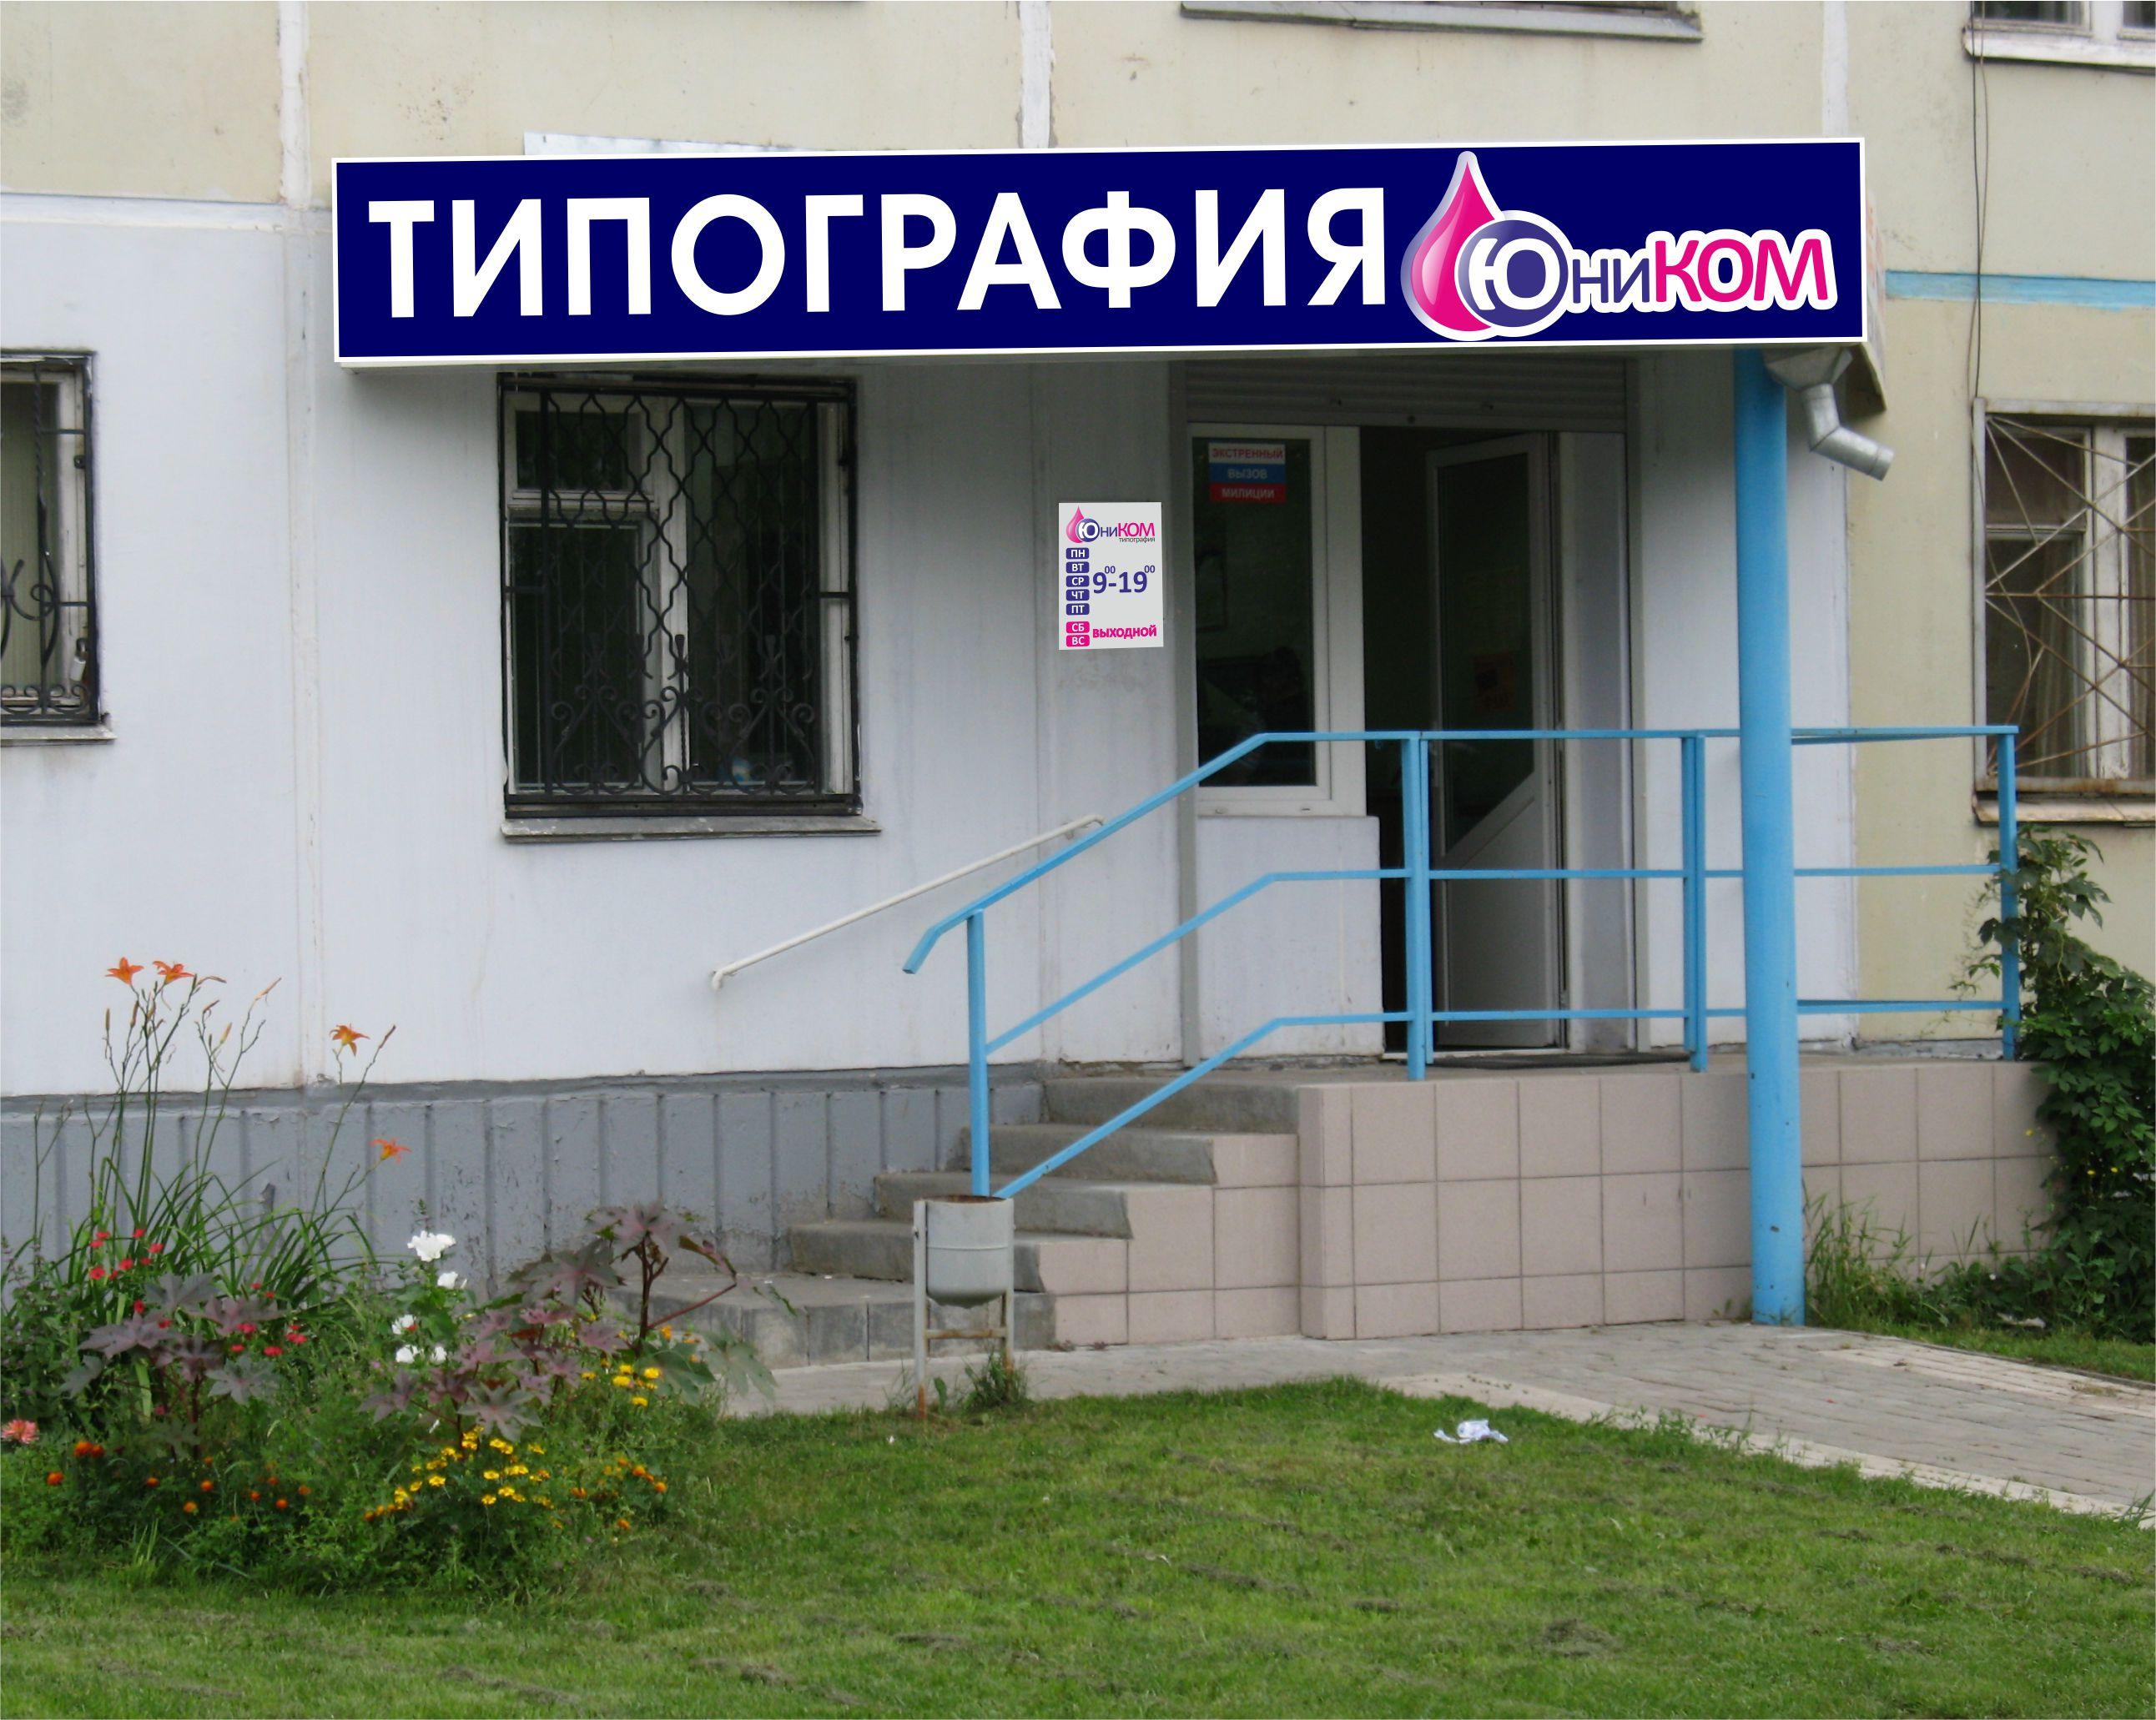 фасад ЮниКОМ